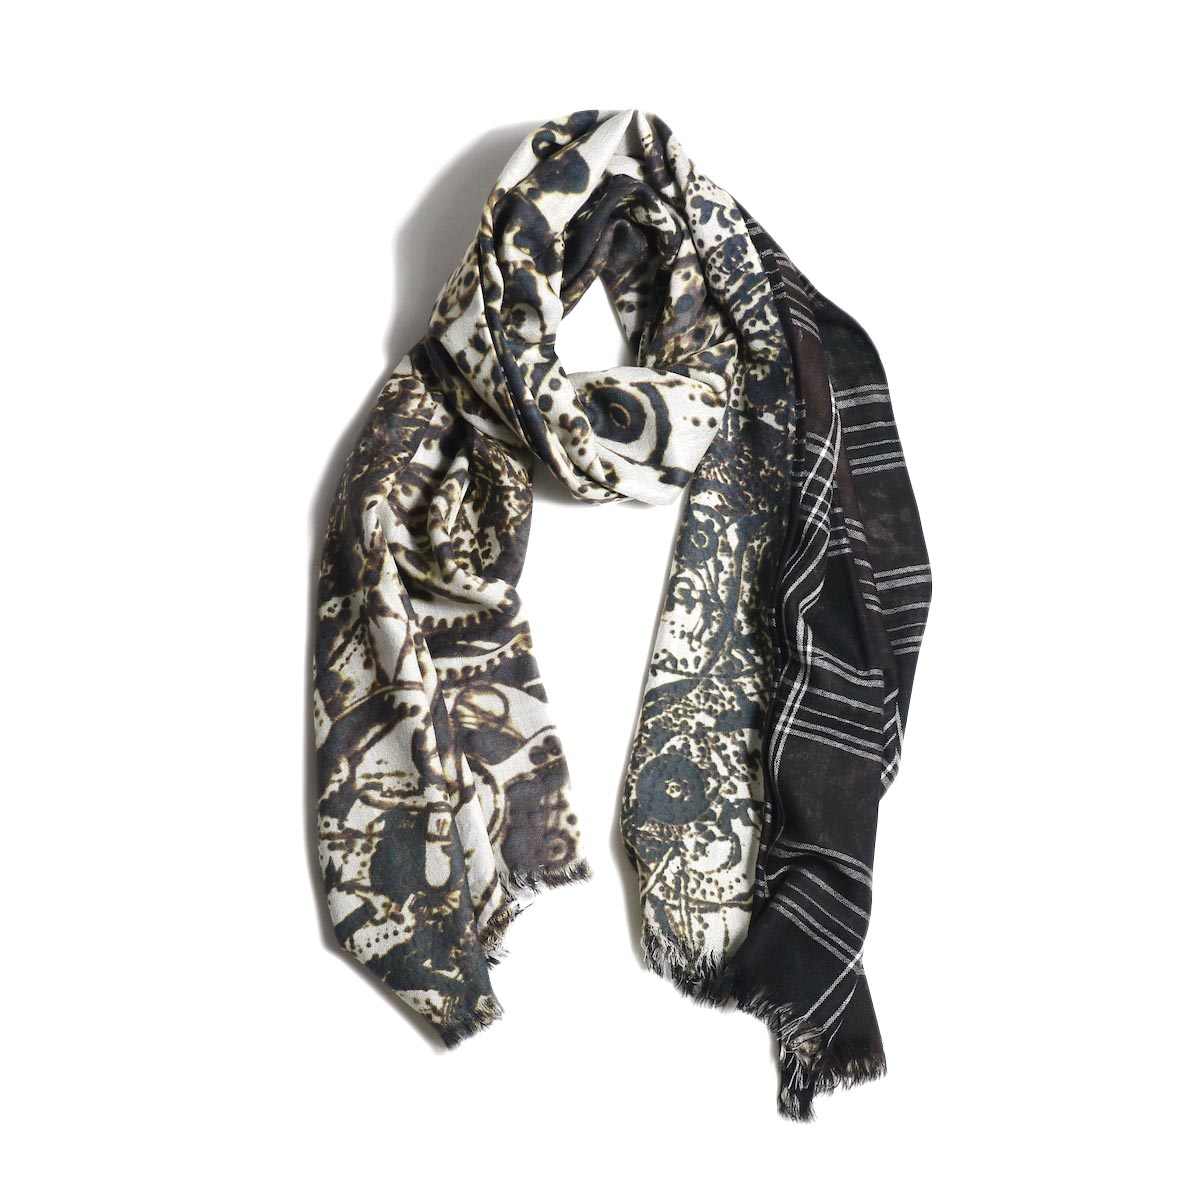 The Soloist / sa.0020AW20 w face rectangle scarf.